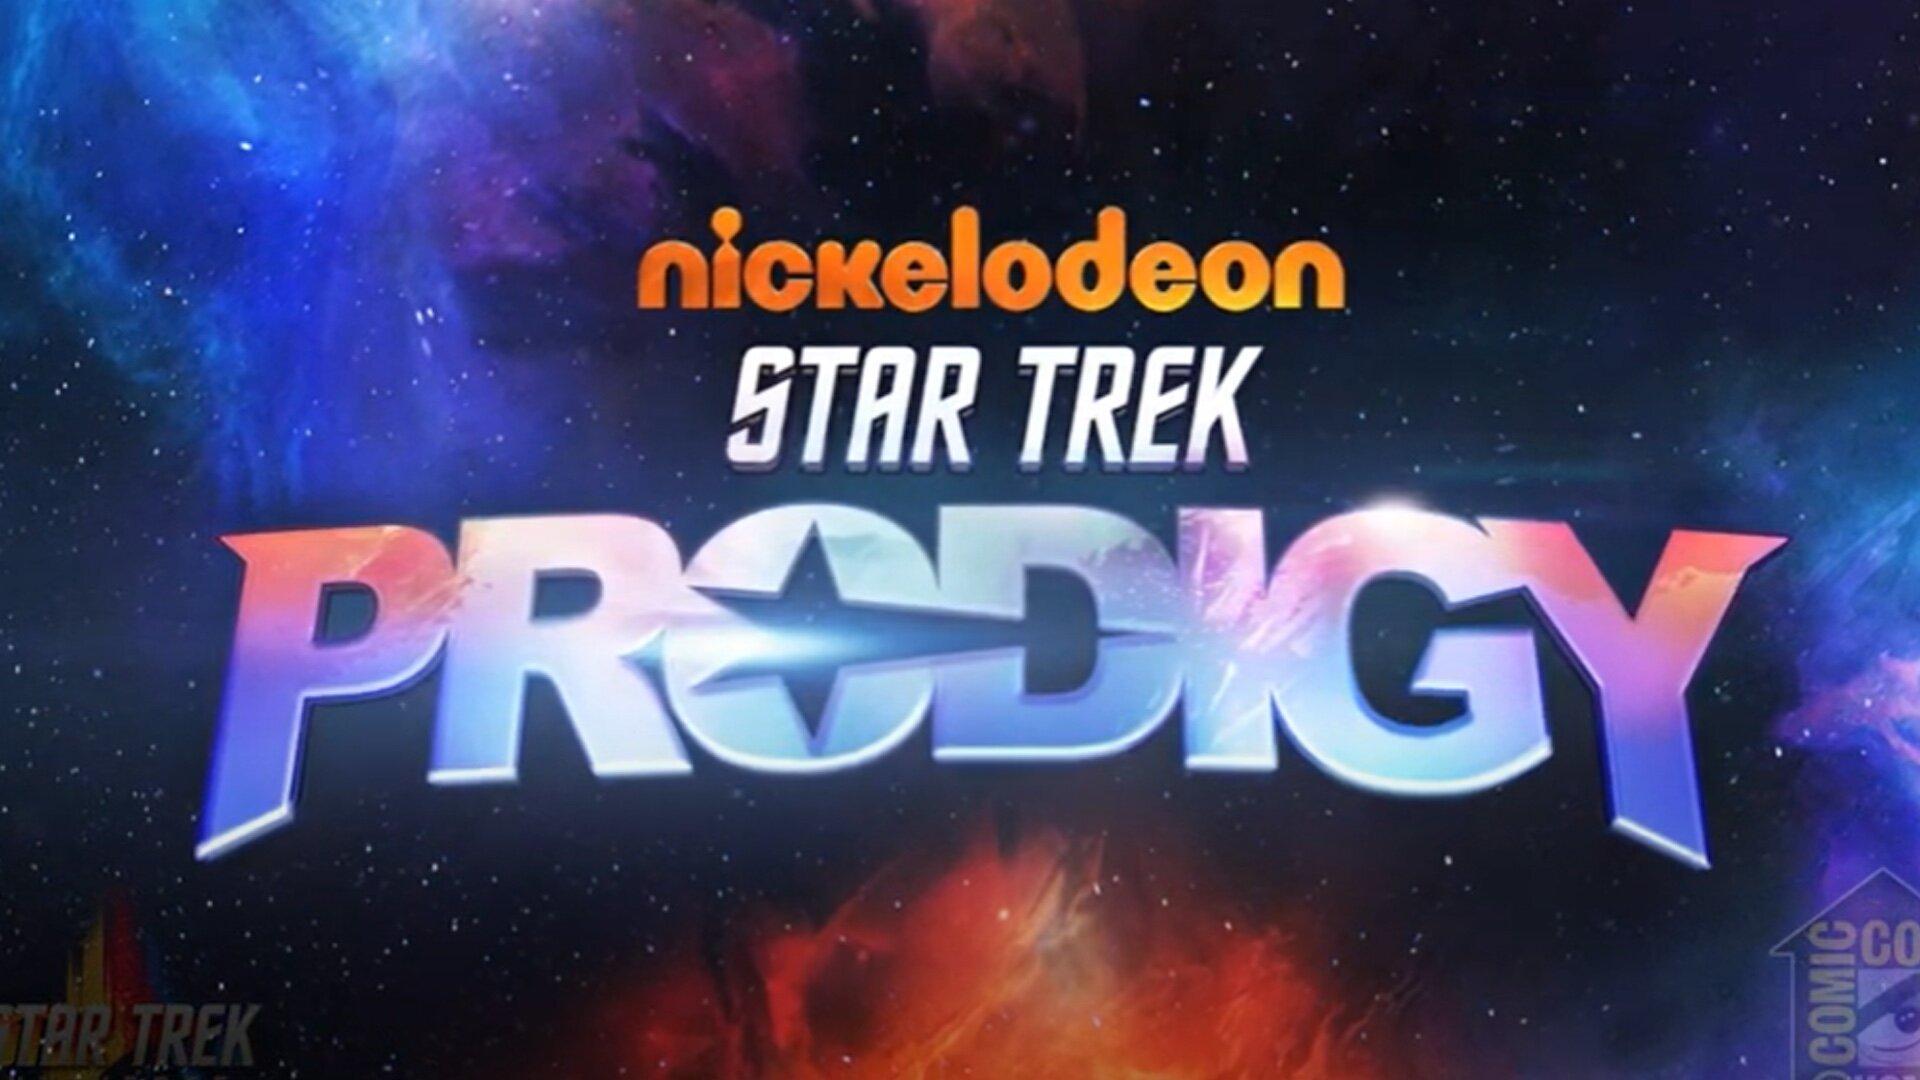 Logo and Info Revealed for Nickelodeon's STAR TREK Animated Kids Series STAR TREK: PRODIGY